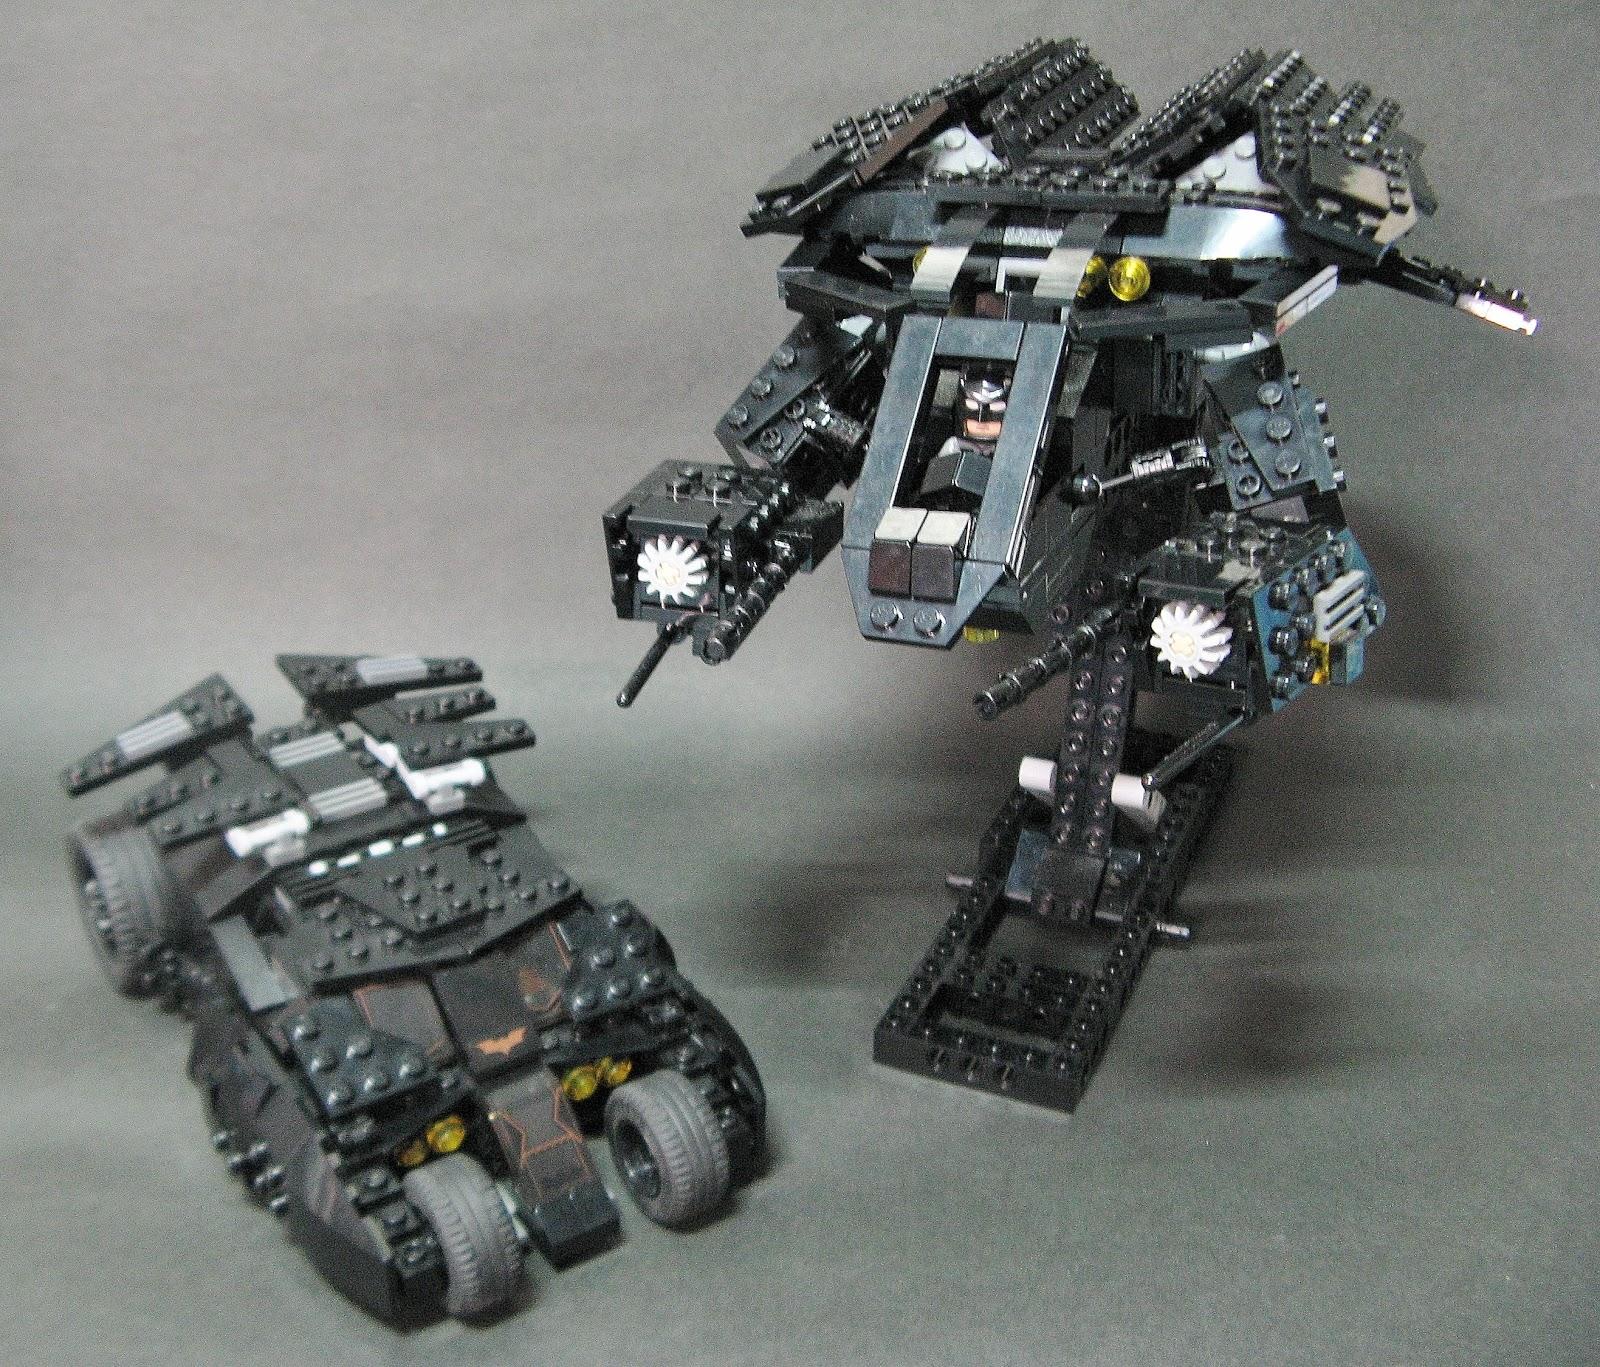 LEGO Vehicle Show(By Bloks)積木機具展 : BATWING- THE BAT (Batman: The Dark Knight Rises)蝙蝠戰機-蝙蝠(蝙蝠俠-夜神起義)RENEW